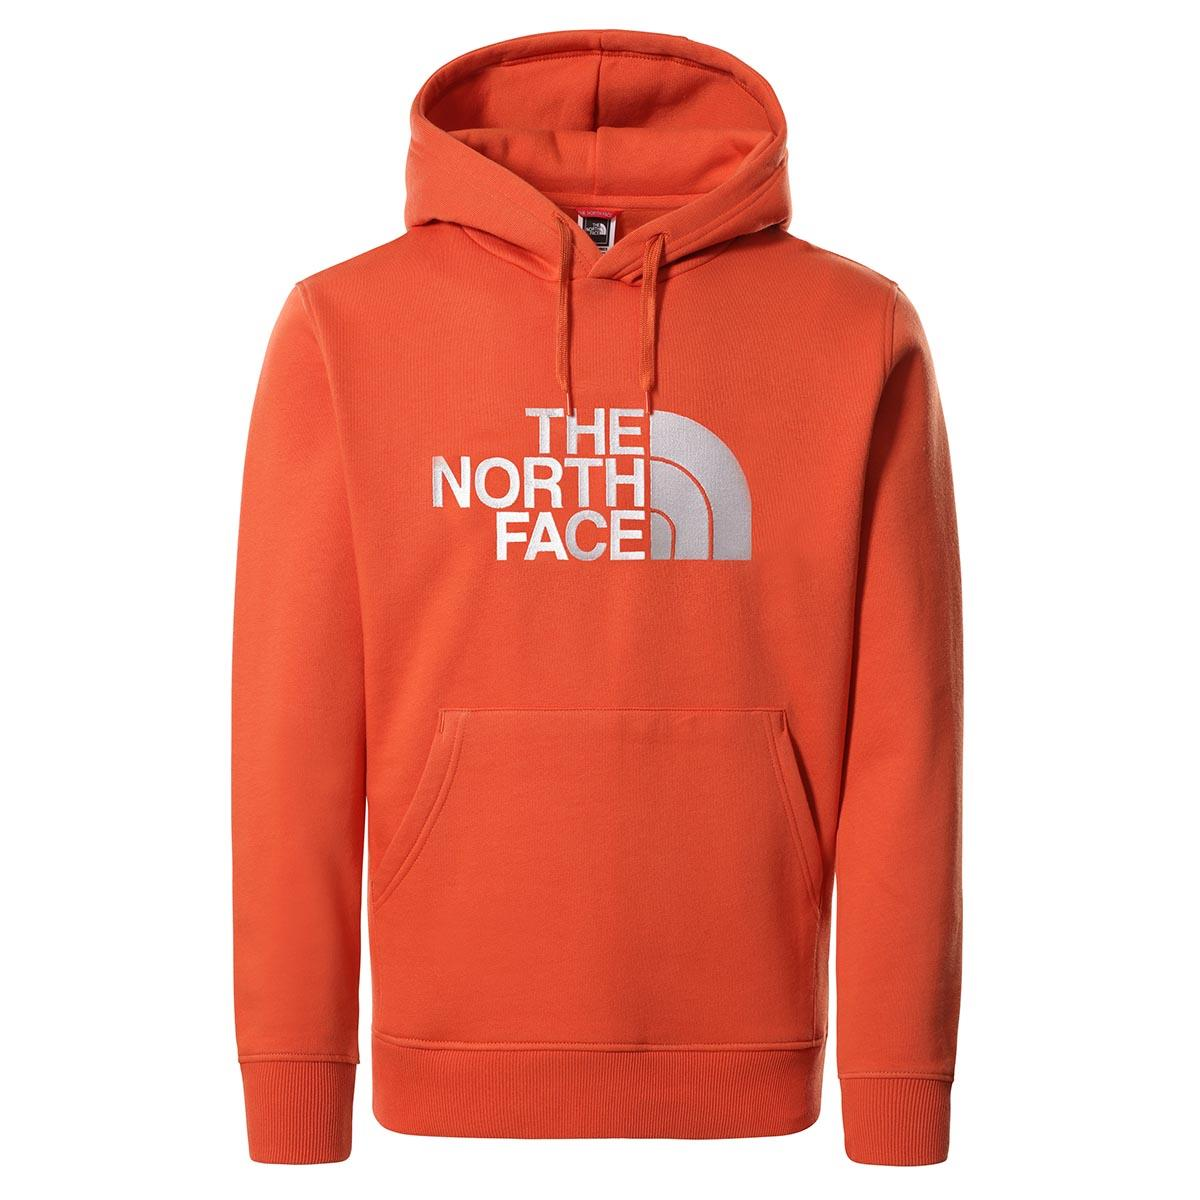 The Northface Erkek DREW PEAK Swetshirt HD NF00AHJYEMJ1